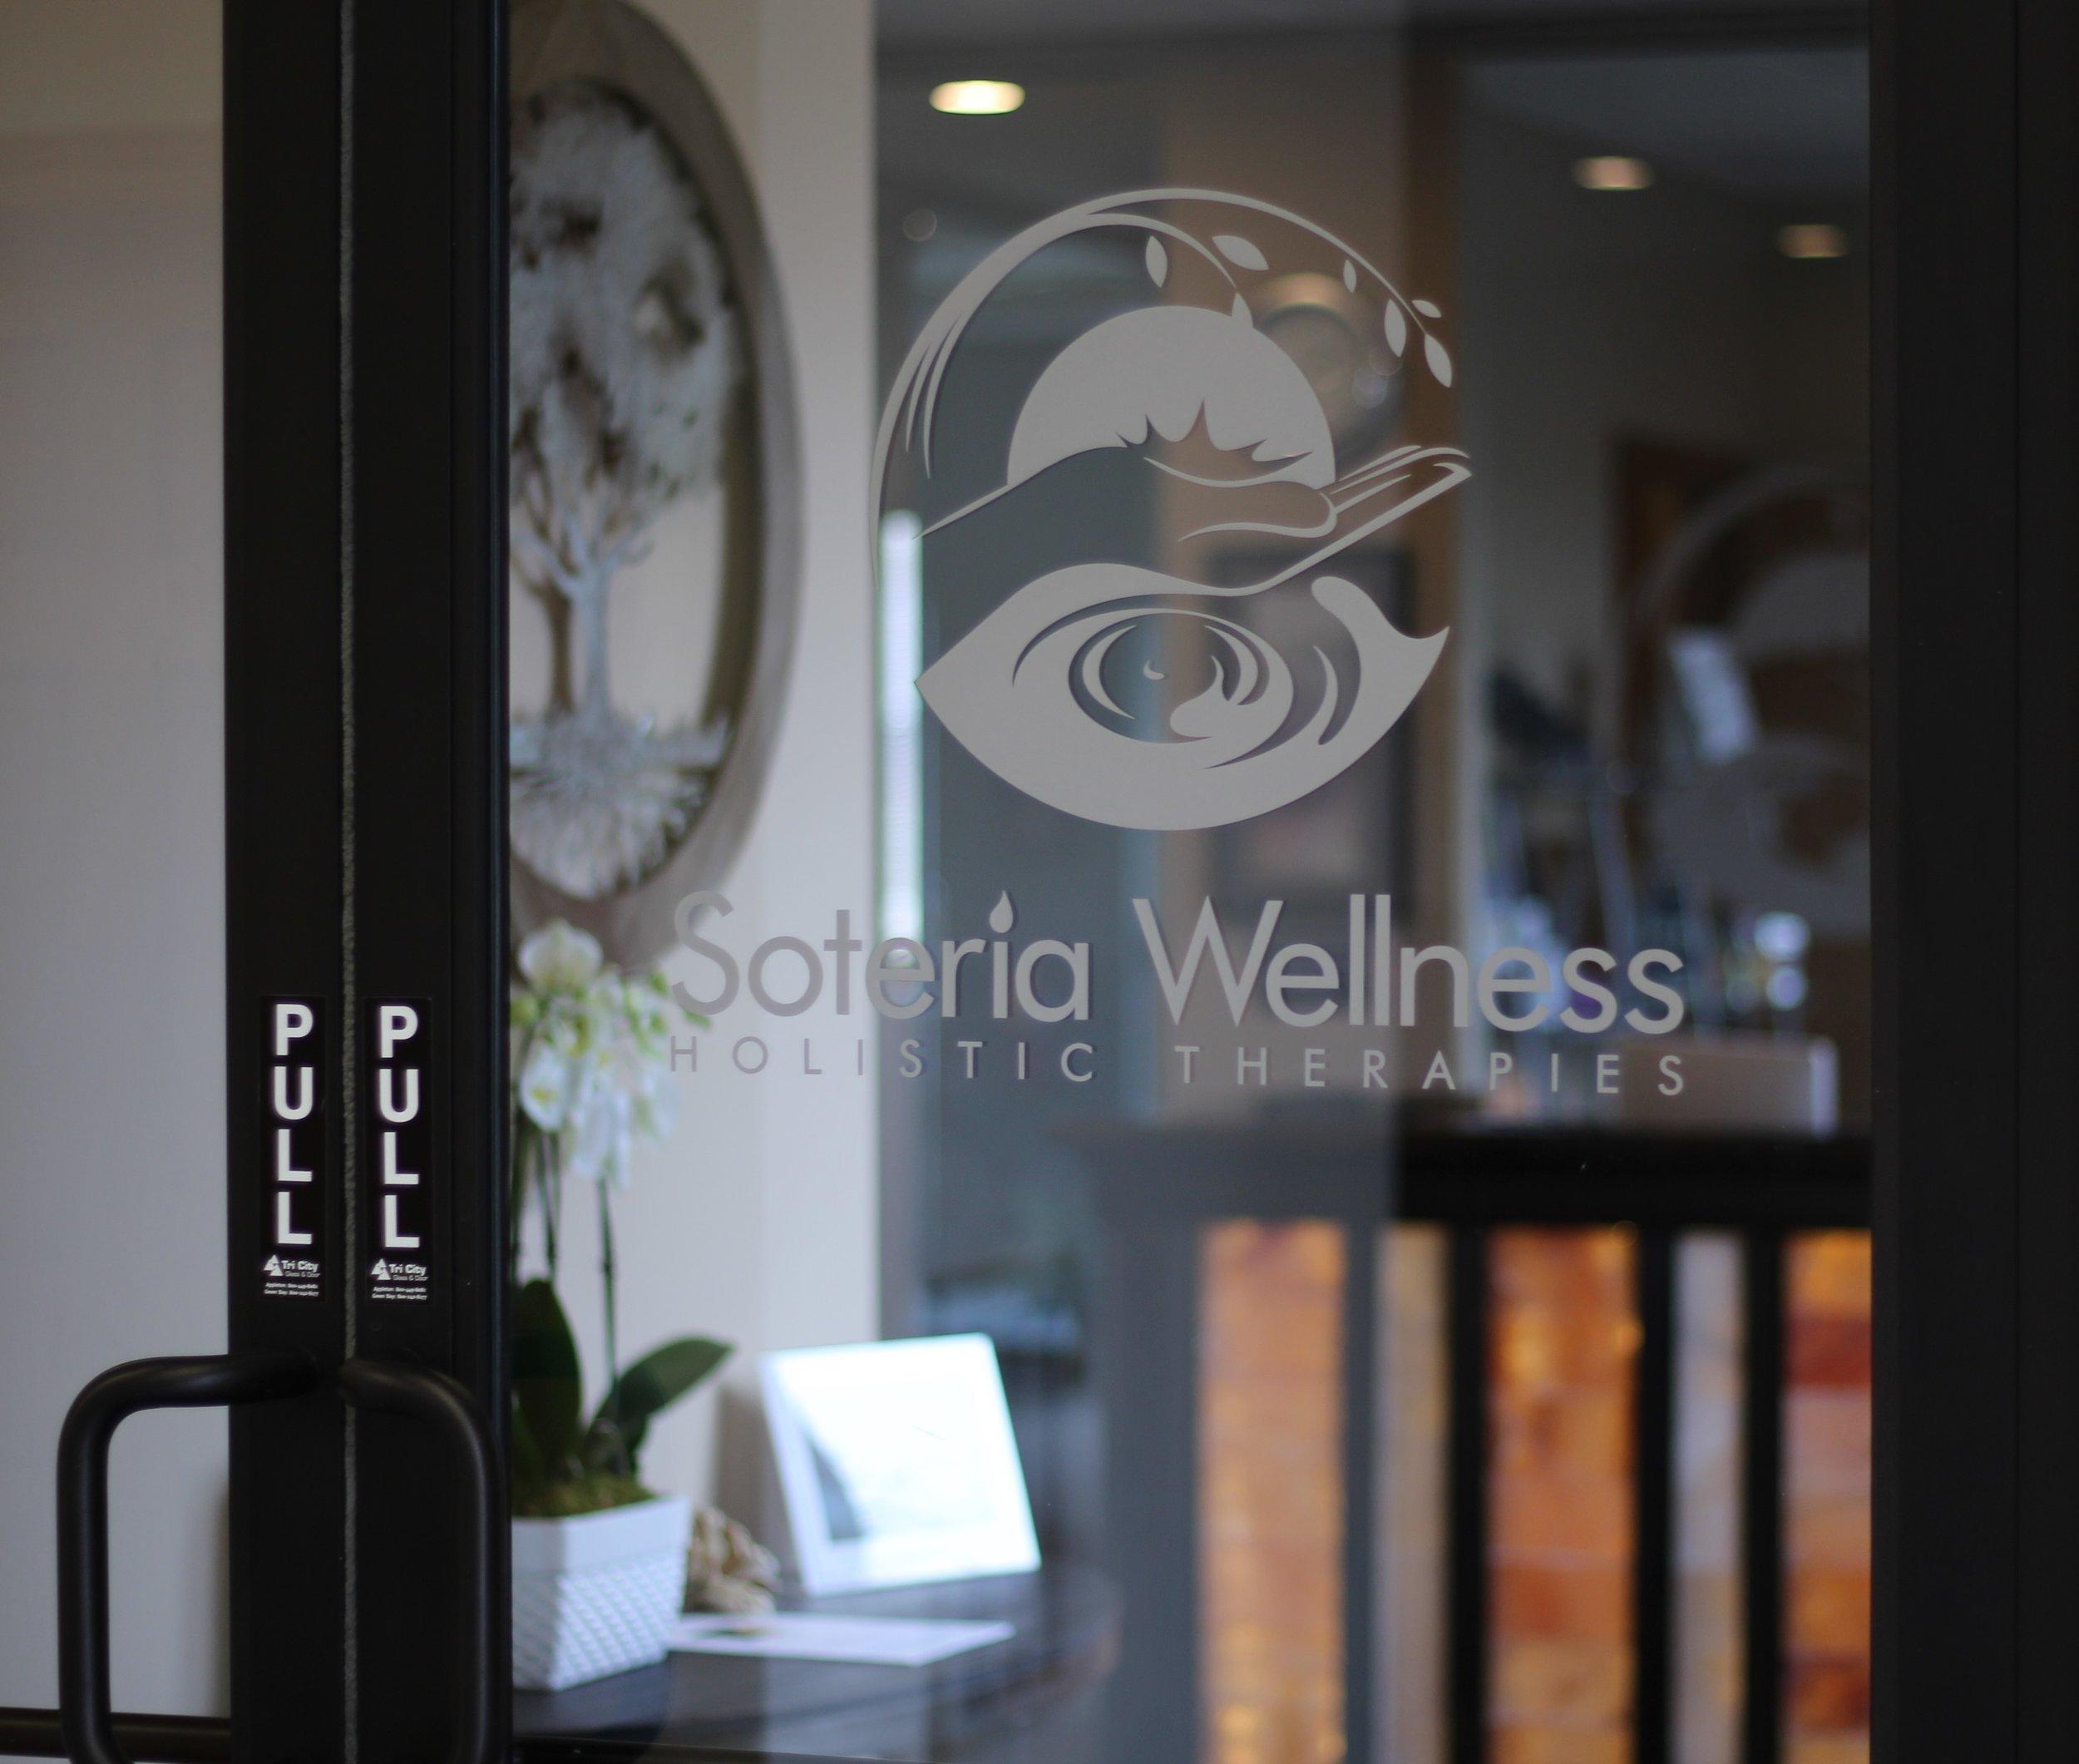 Open House Celebration Soteria Wellness 6.13.19